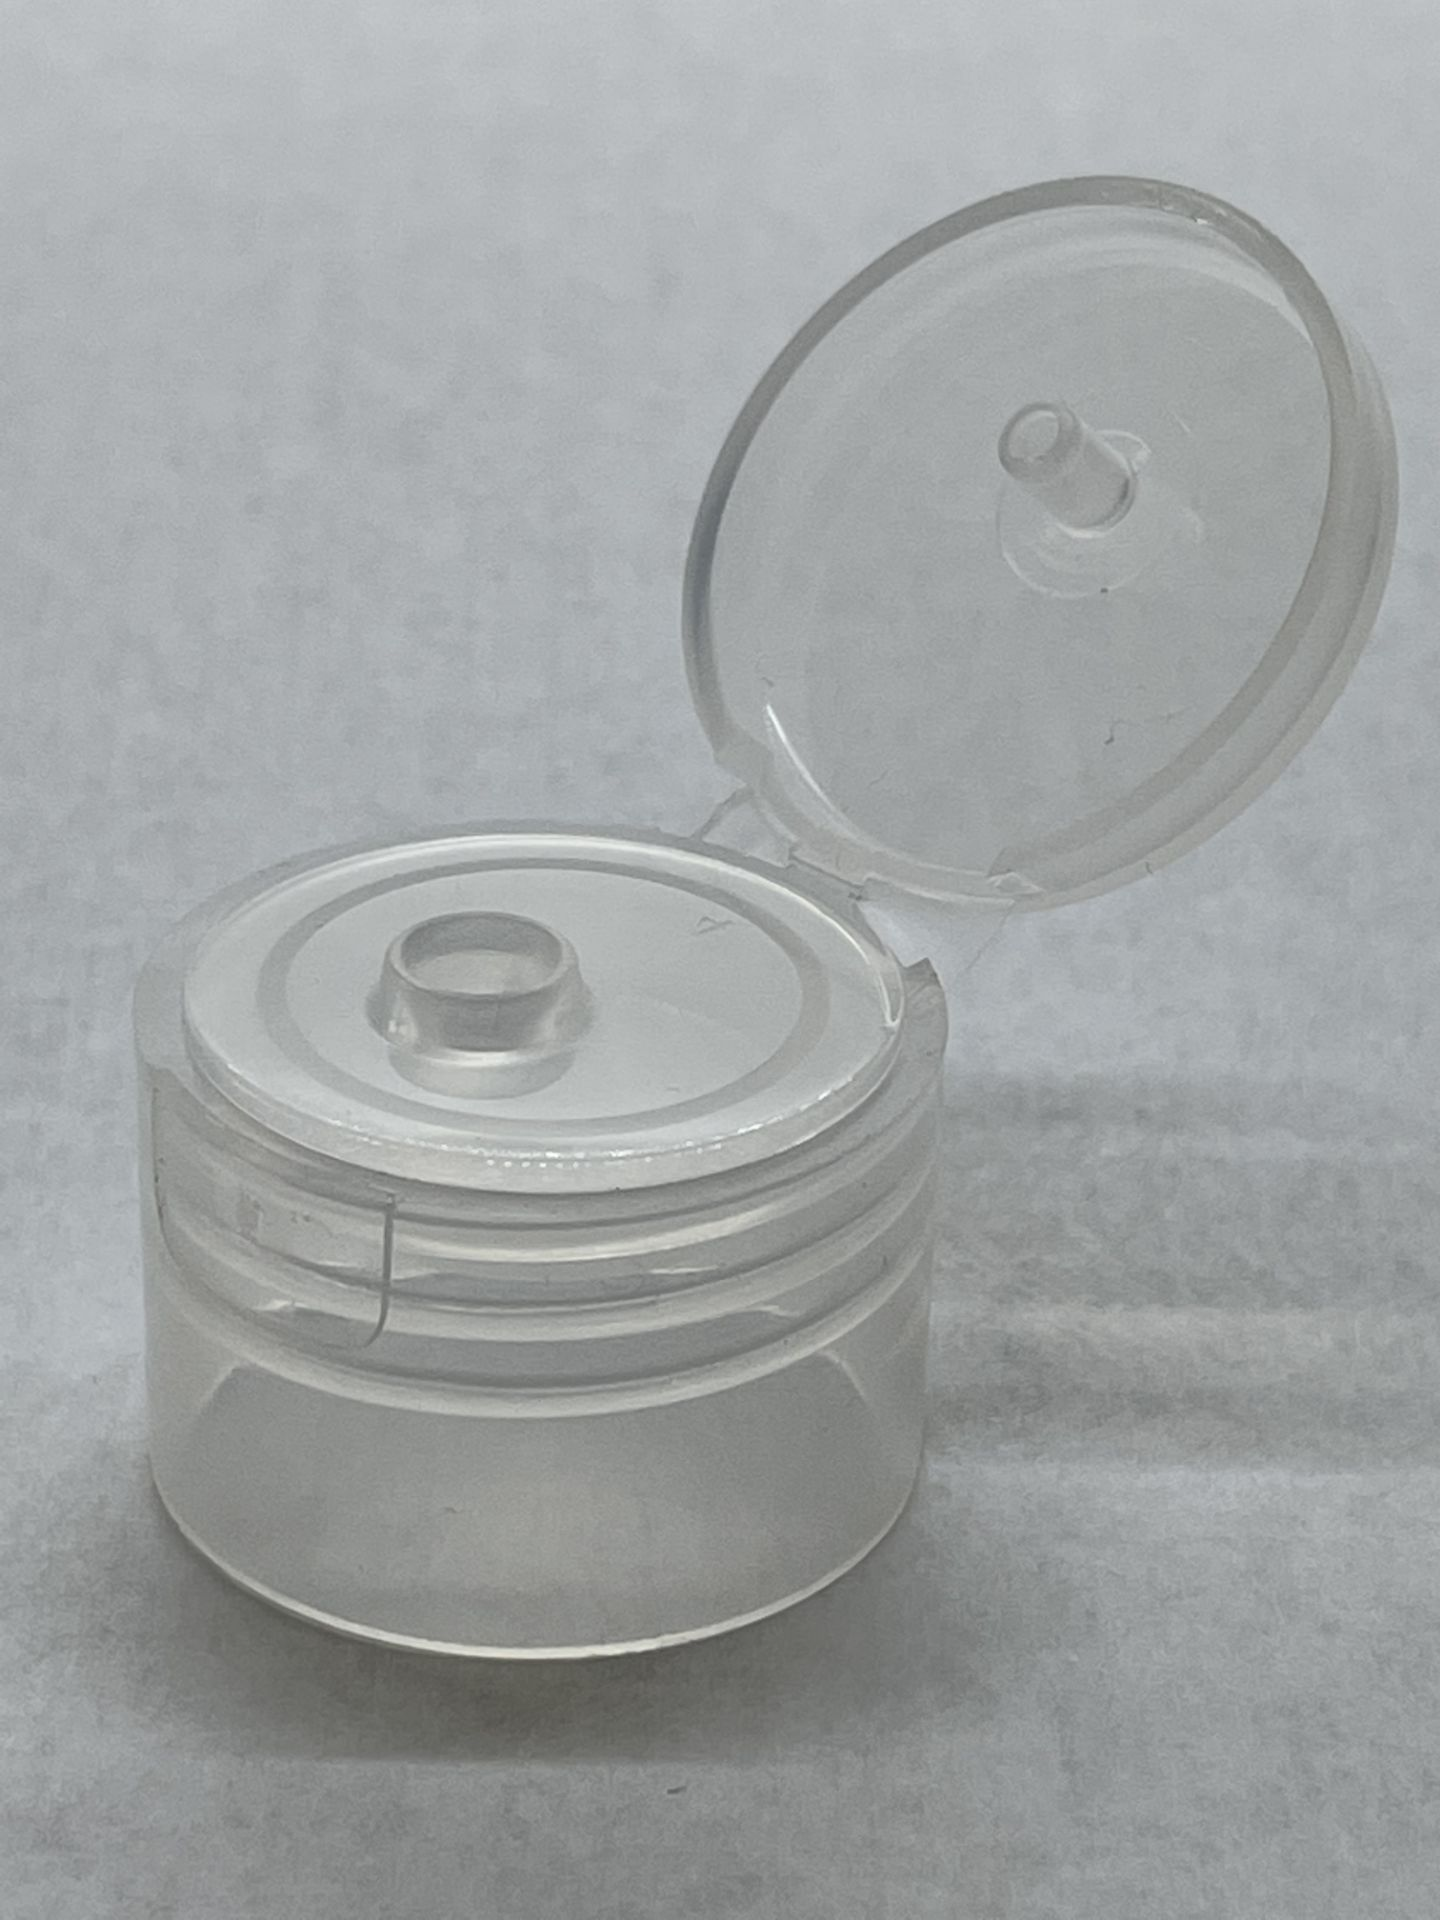 128,000 - Clear Flip Bottle Caps for 4oz and 8oz bottle, 24-410.